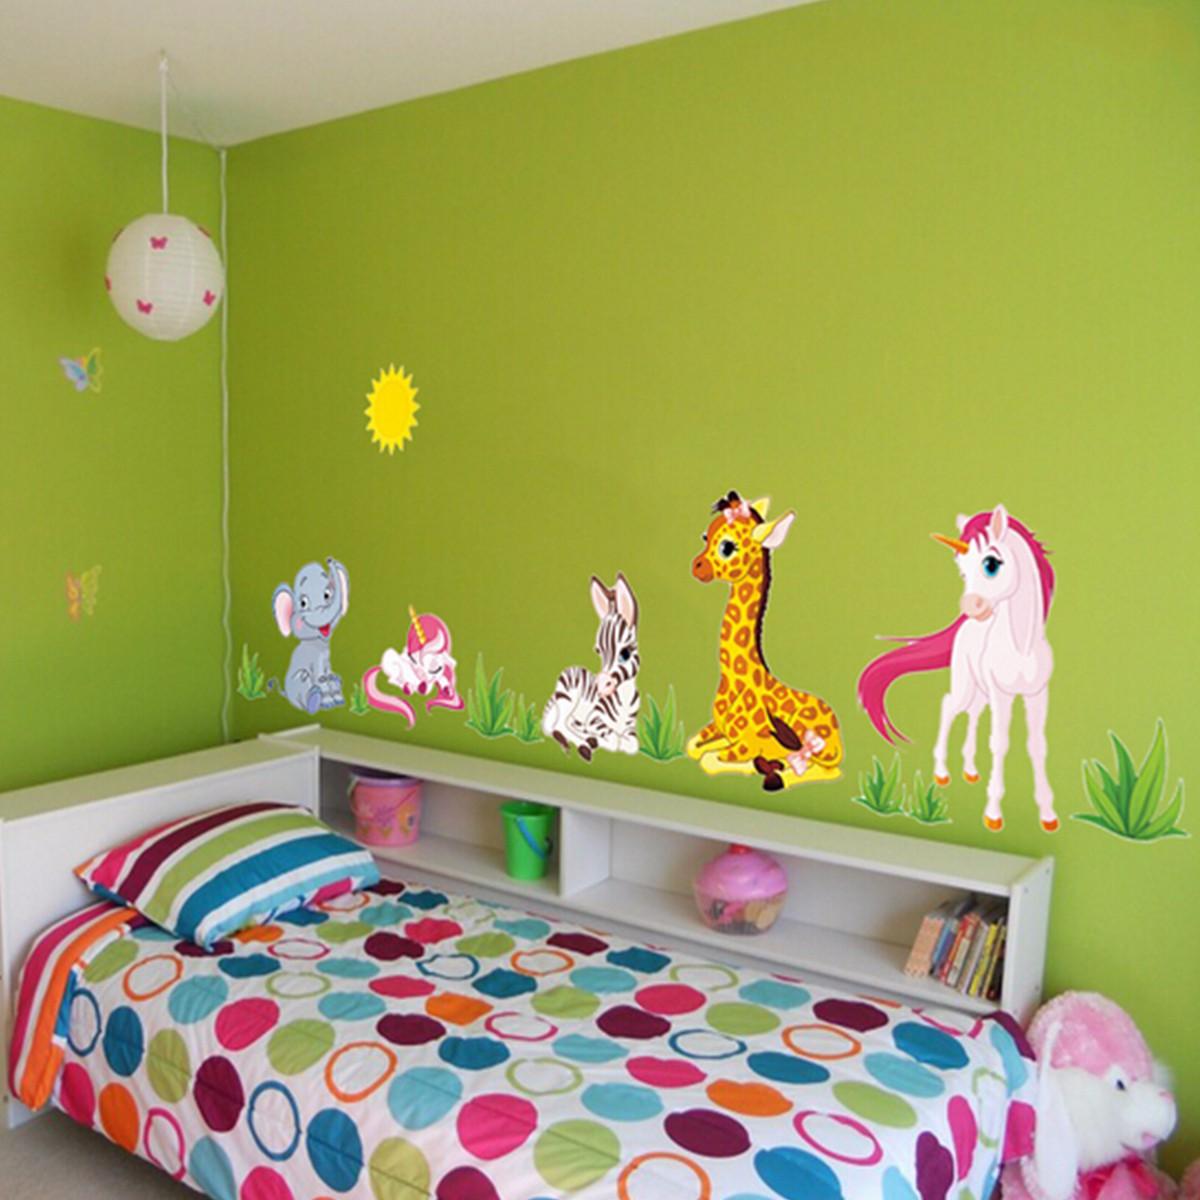 Animal Home Decor: Cartoon Animal Elephant Giraffes Grass Bedroom Removable